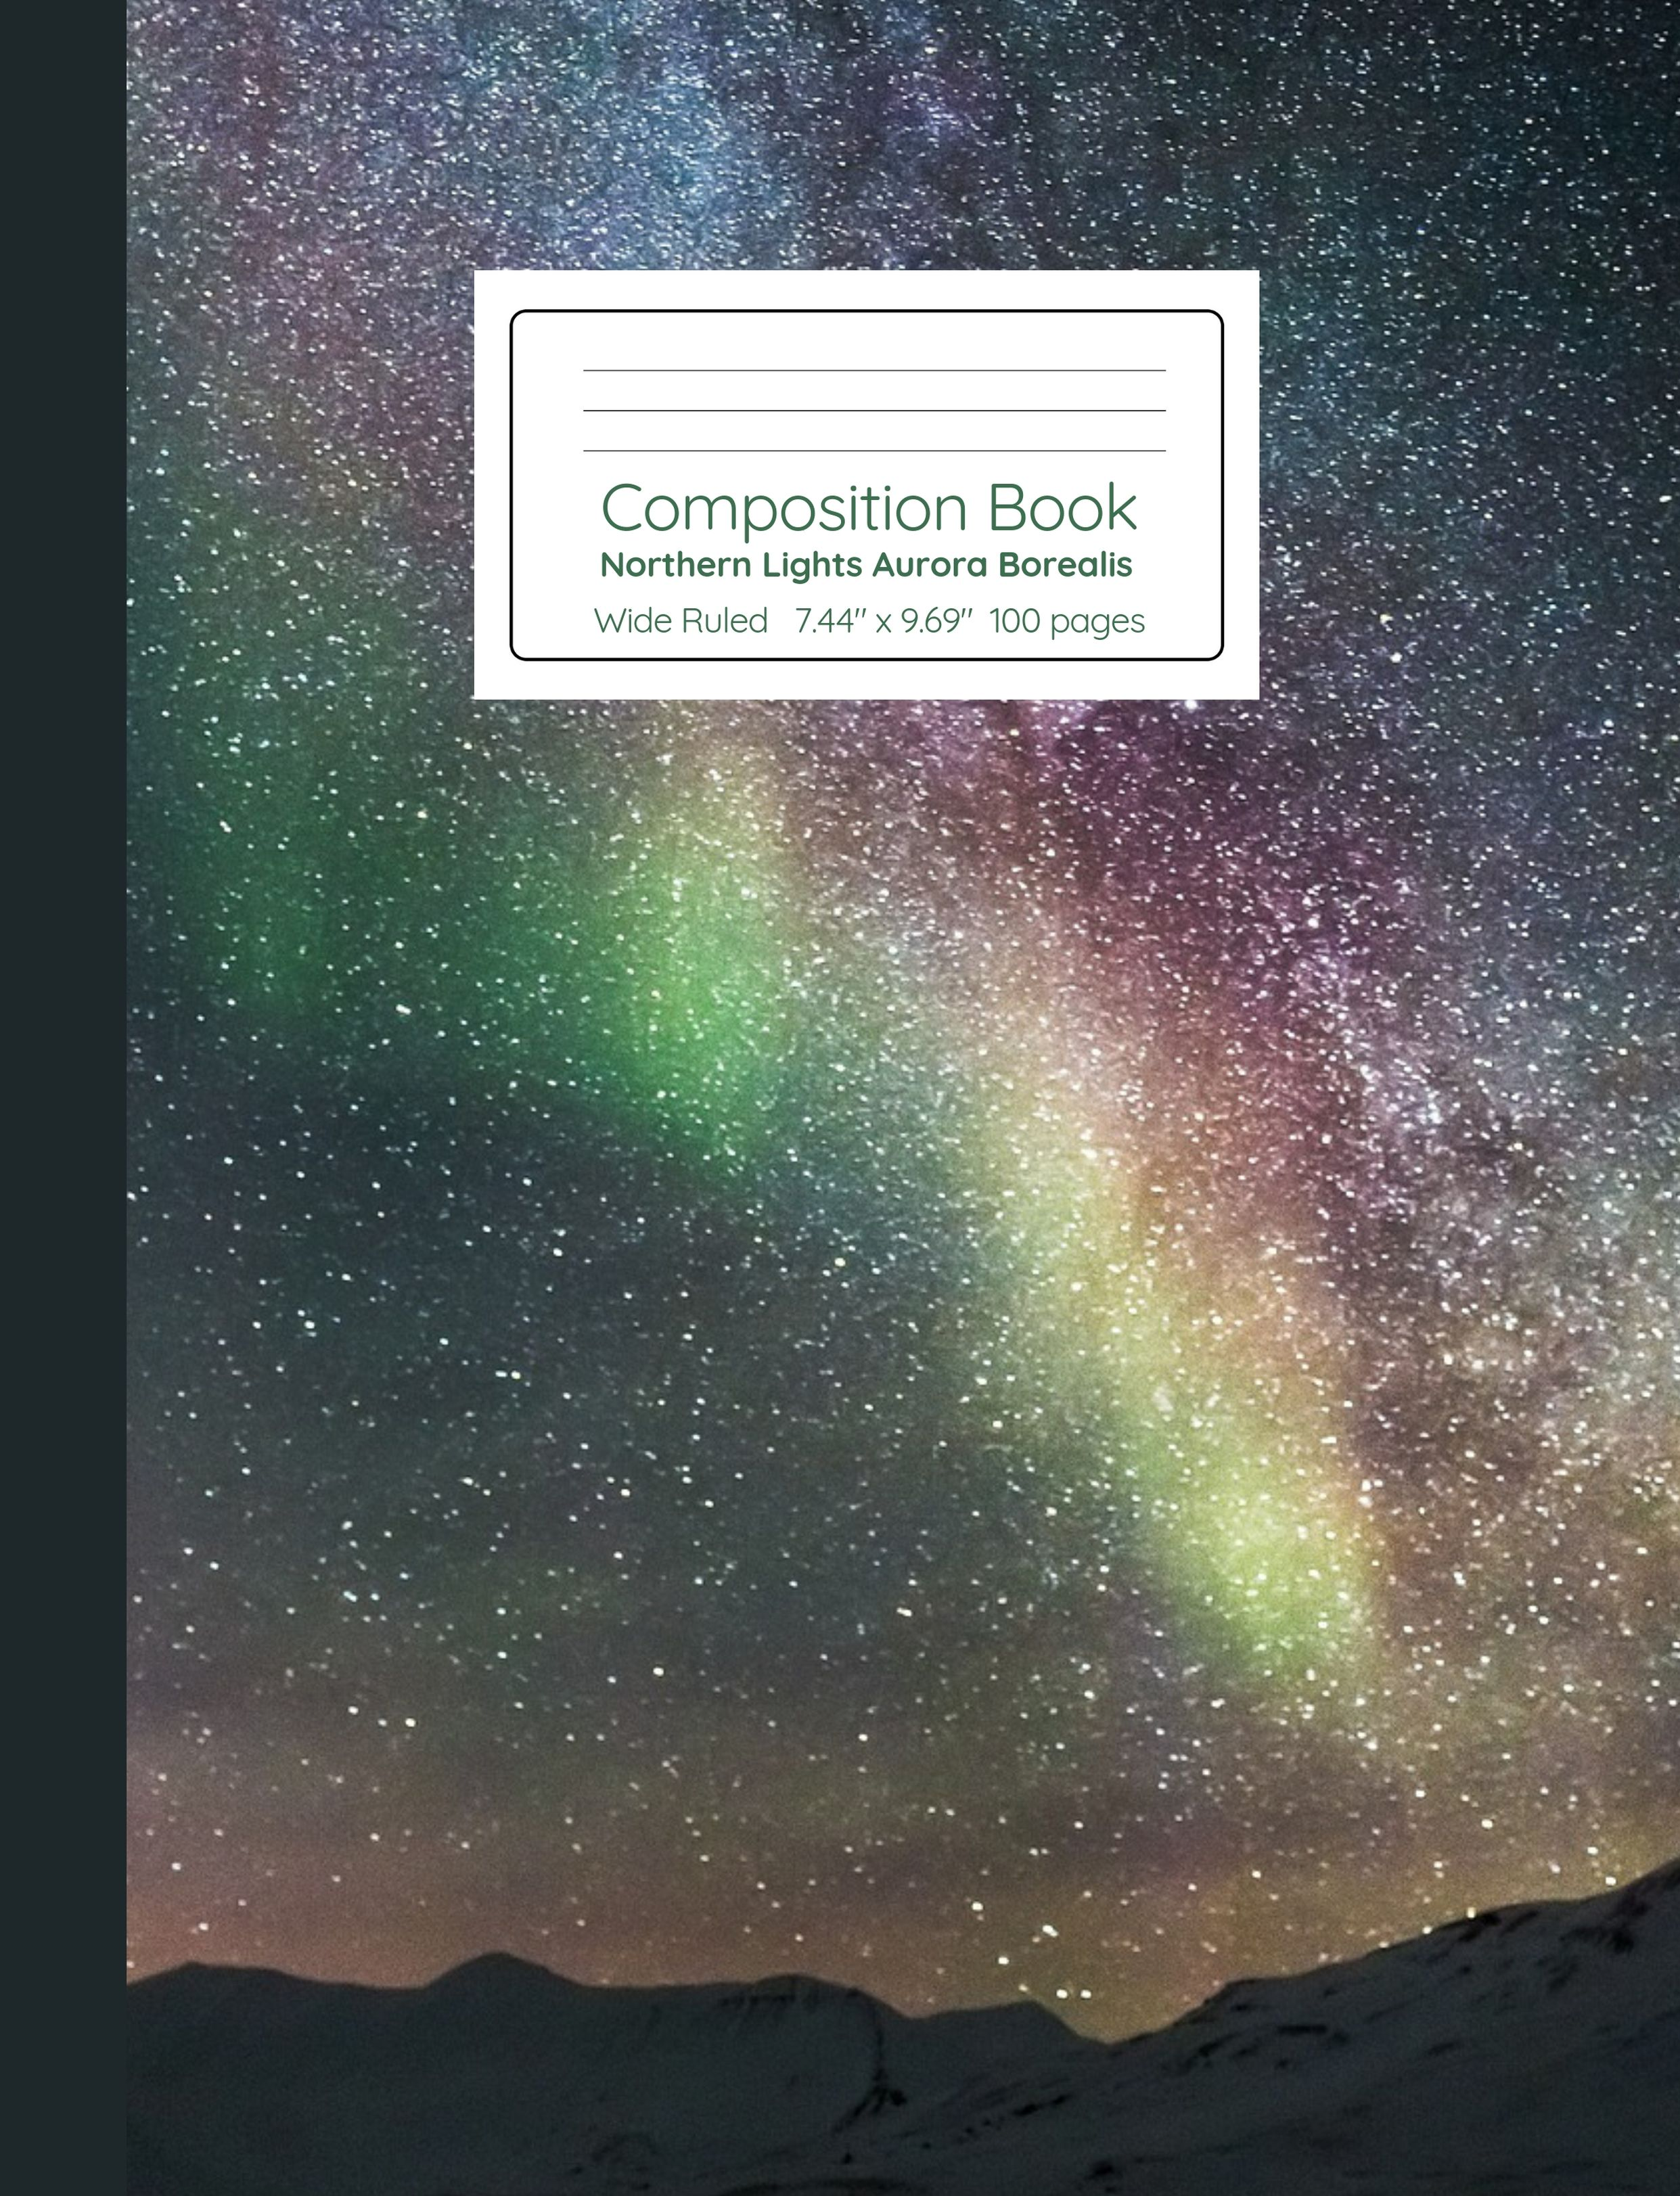 Northern Lights Aurora Borealis Composition Book